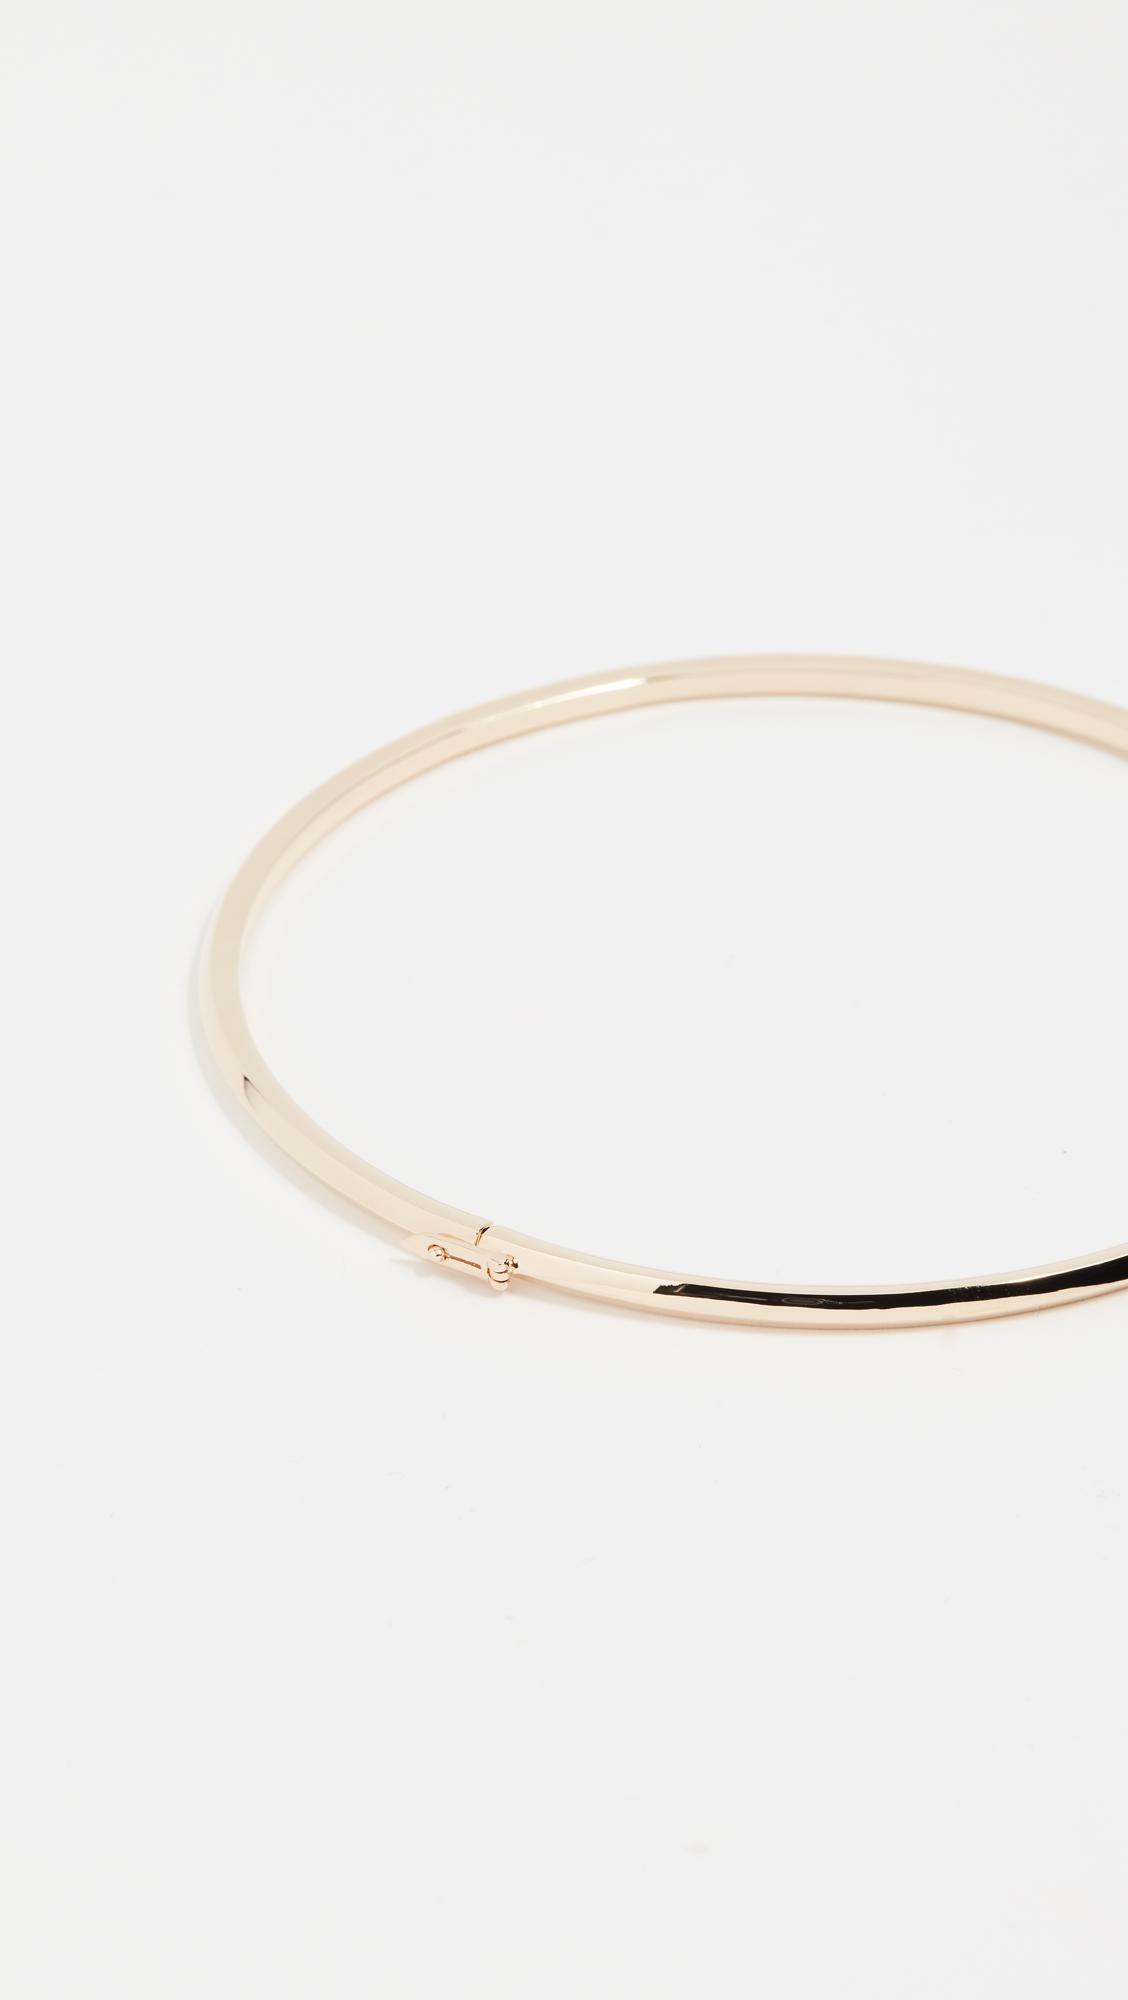 Eddie Borgo Peaked Collar Necklace in Gold (Metallic)